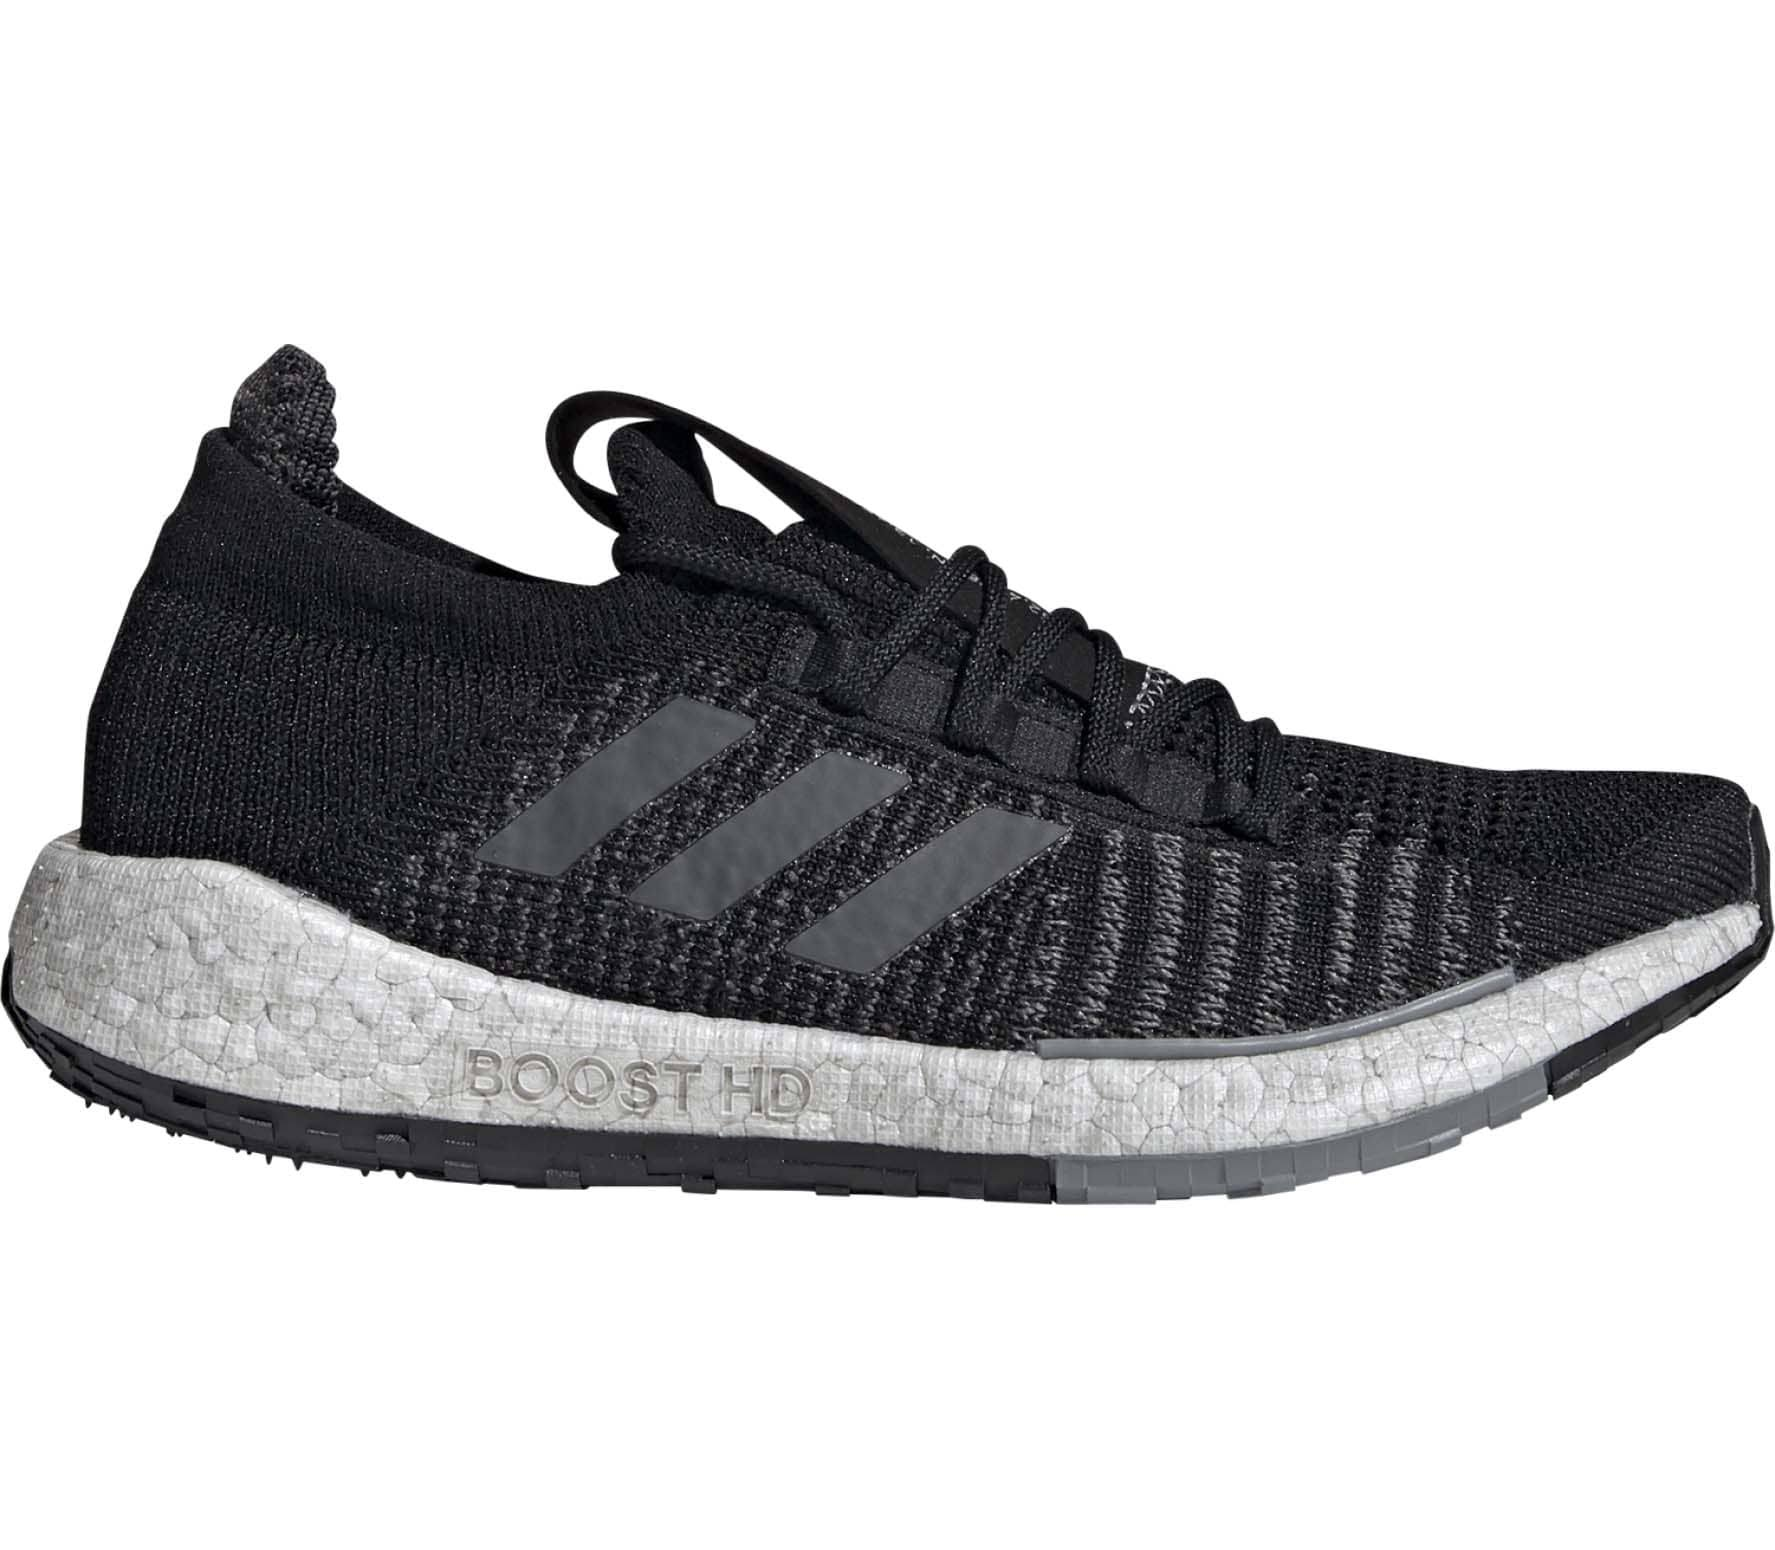 Adidas Pulseboost HD Shoes - Black - Women